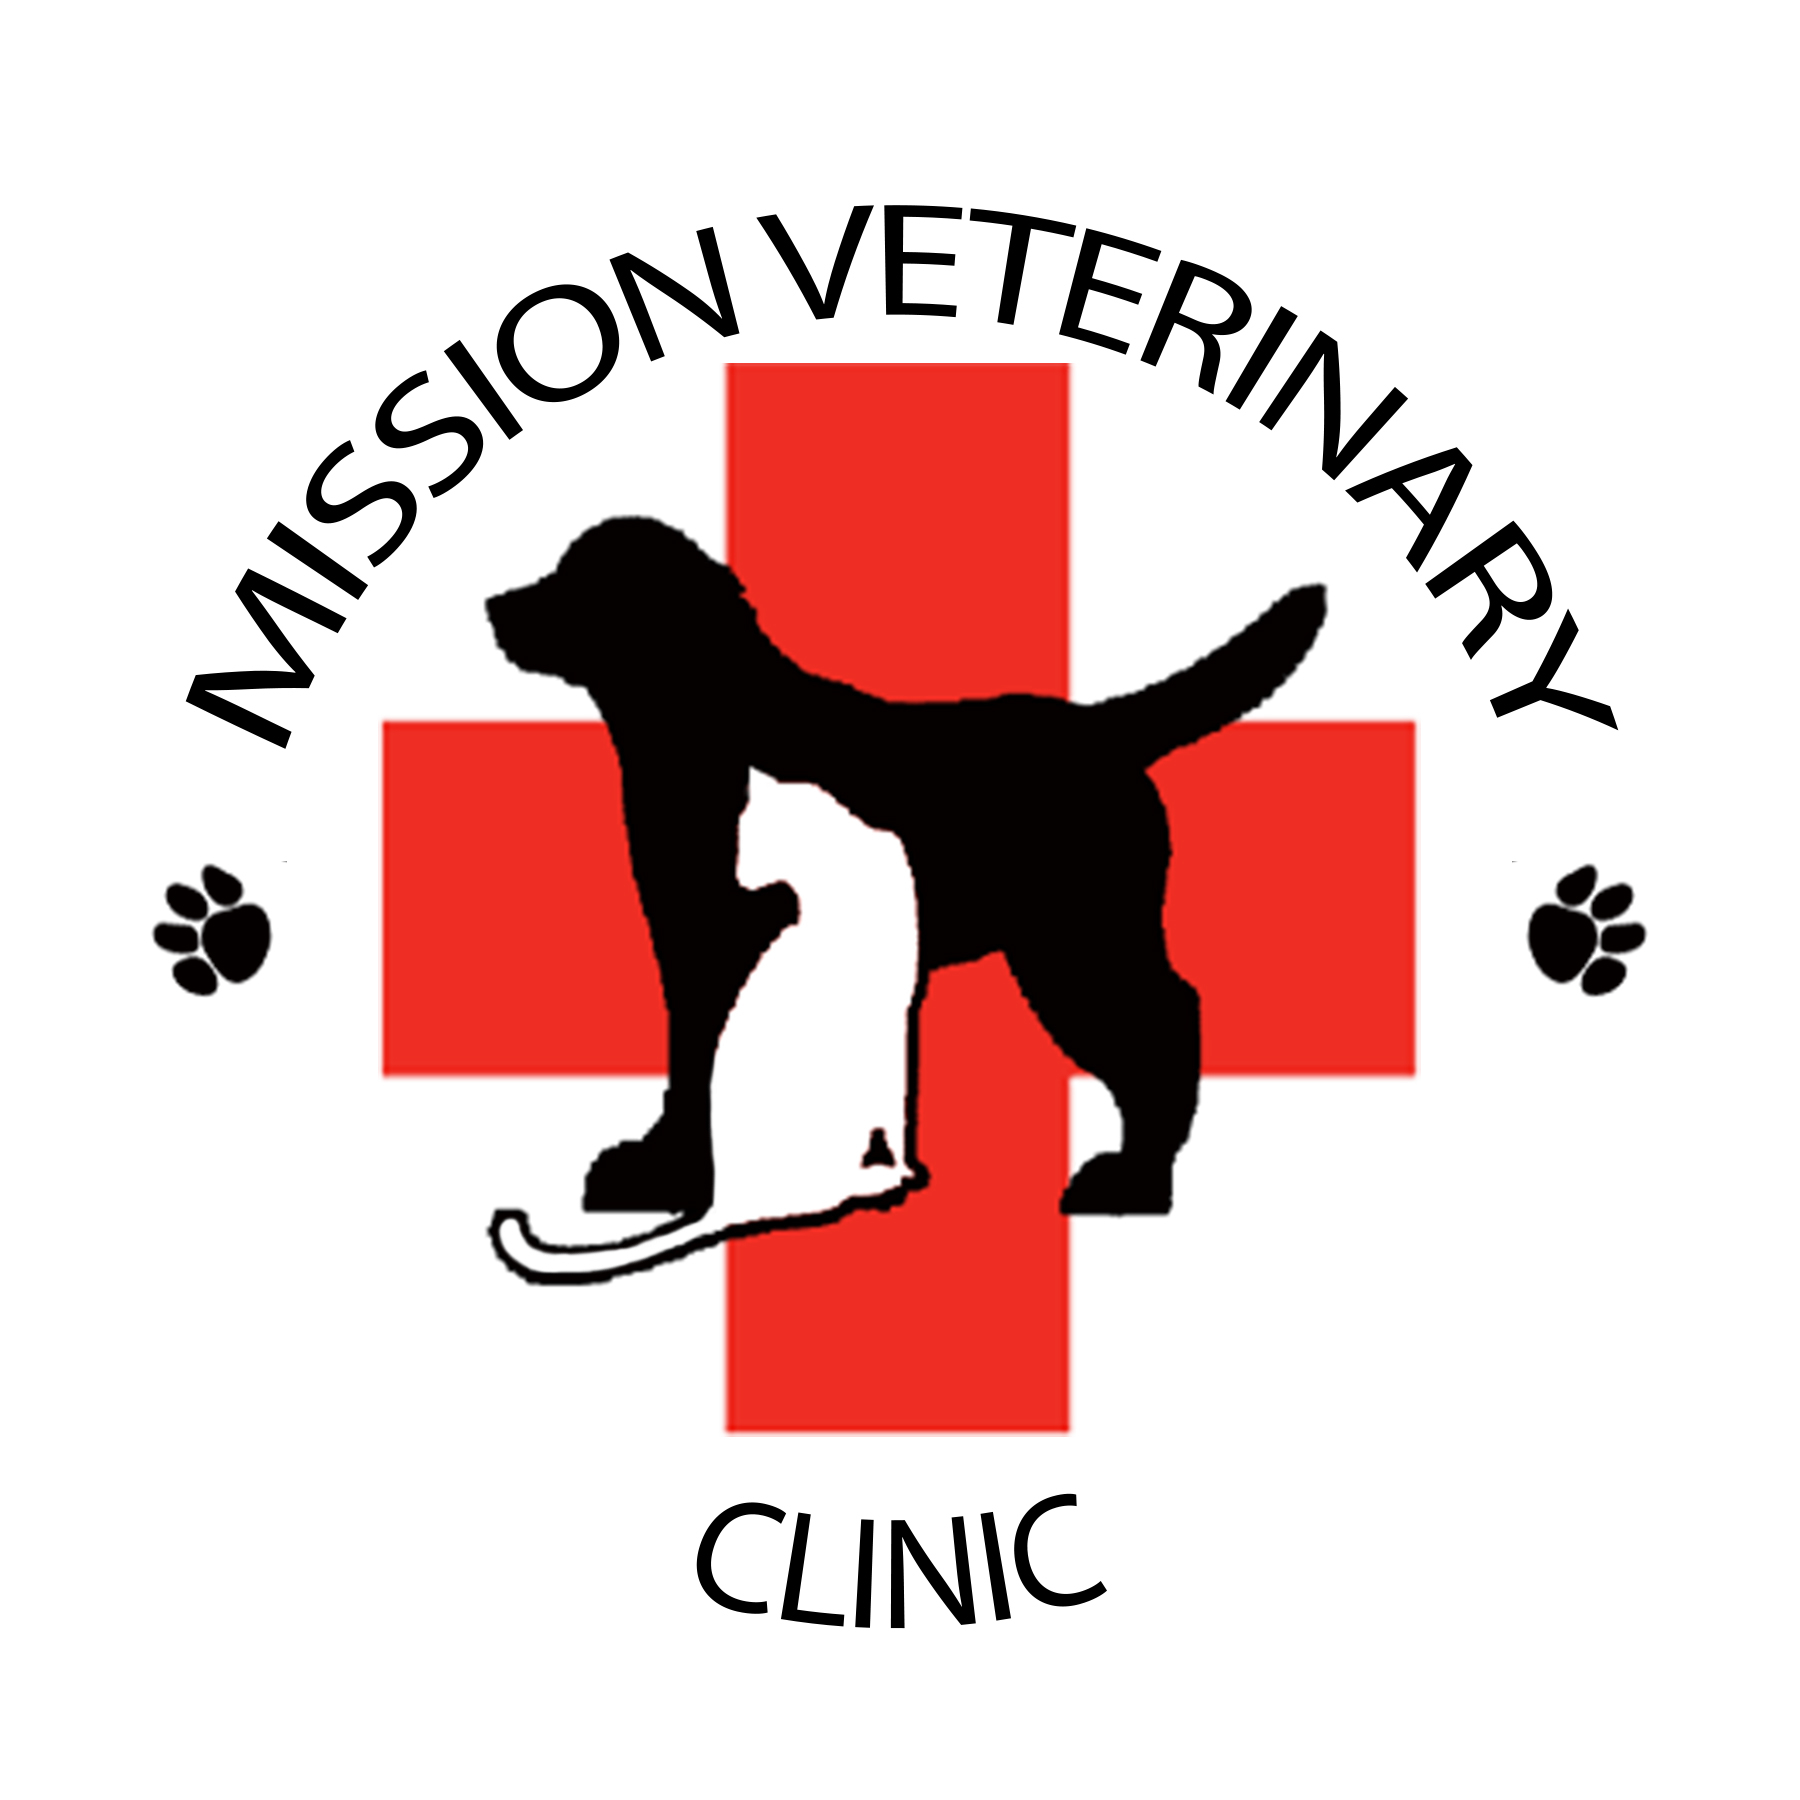 Mission Veterinary Clinic and Animal Emergency Hospital - Granada Hills, CA - Veterinarians